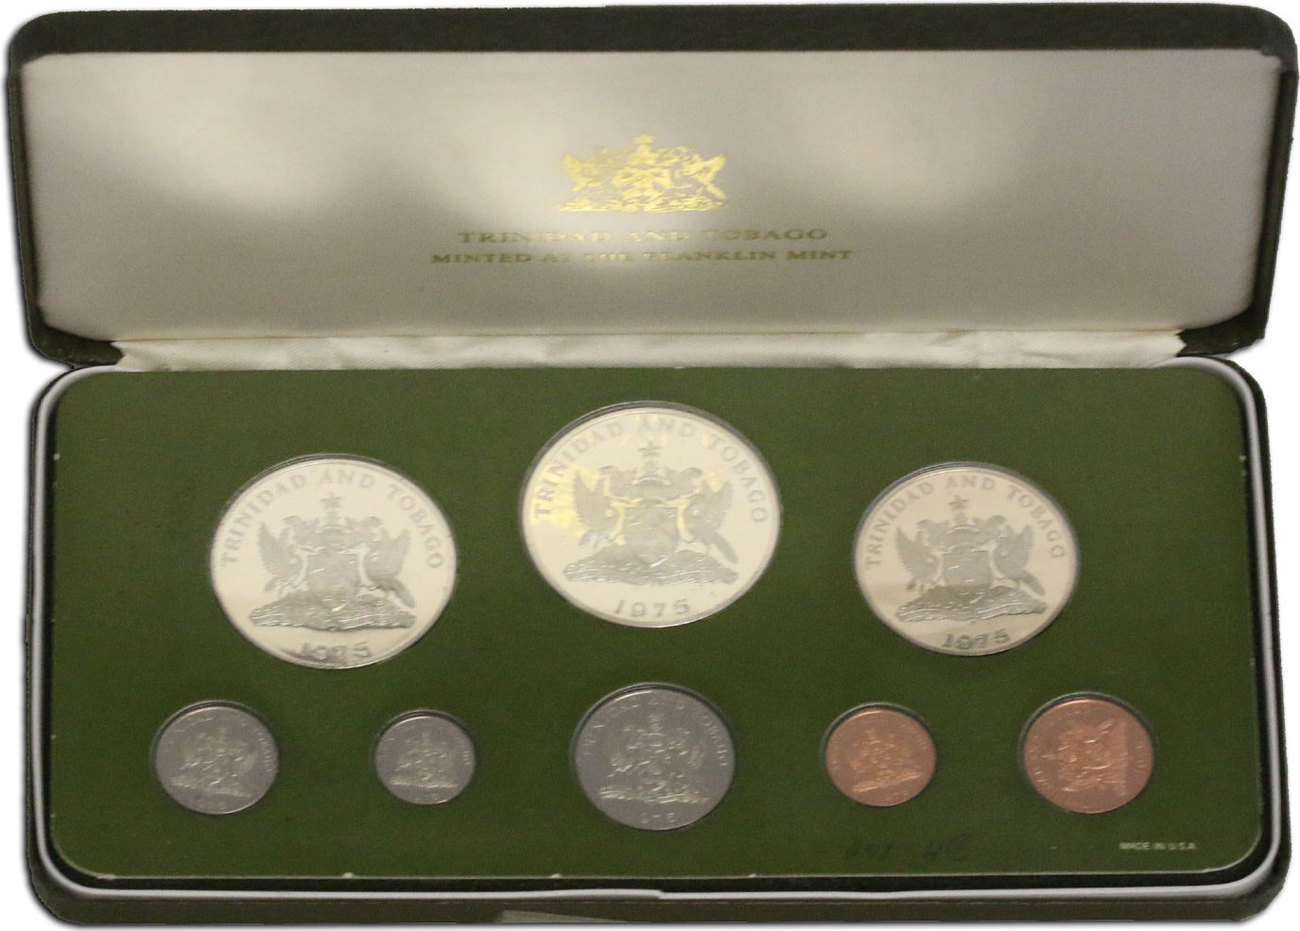 KMS (Cent - 10 Dollar) 1975 Trinidad & Tobago Offizieller Kursmünzensatz pp. im Originaletui mit Zertifikat